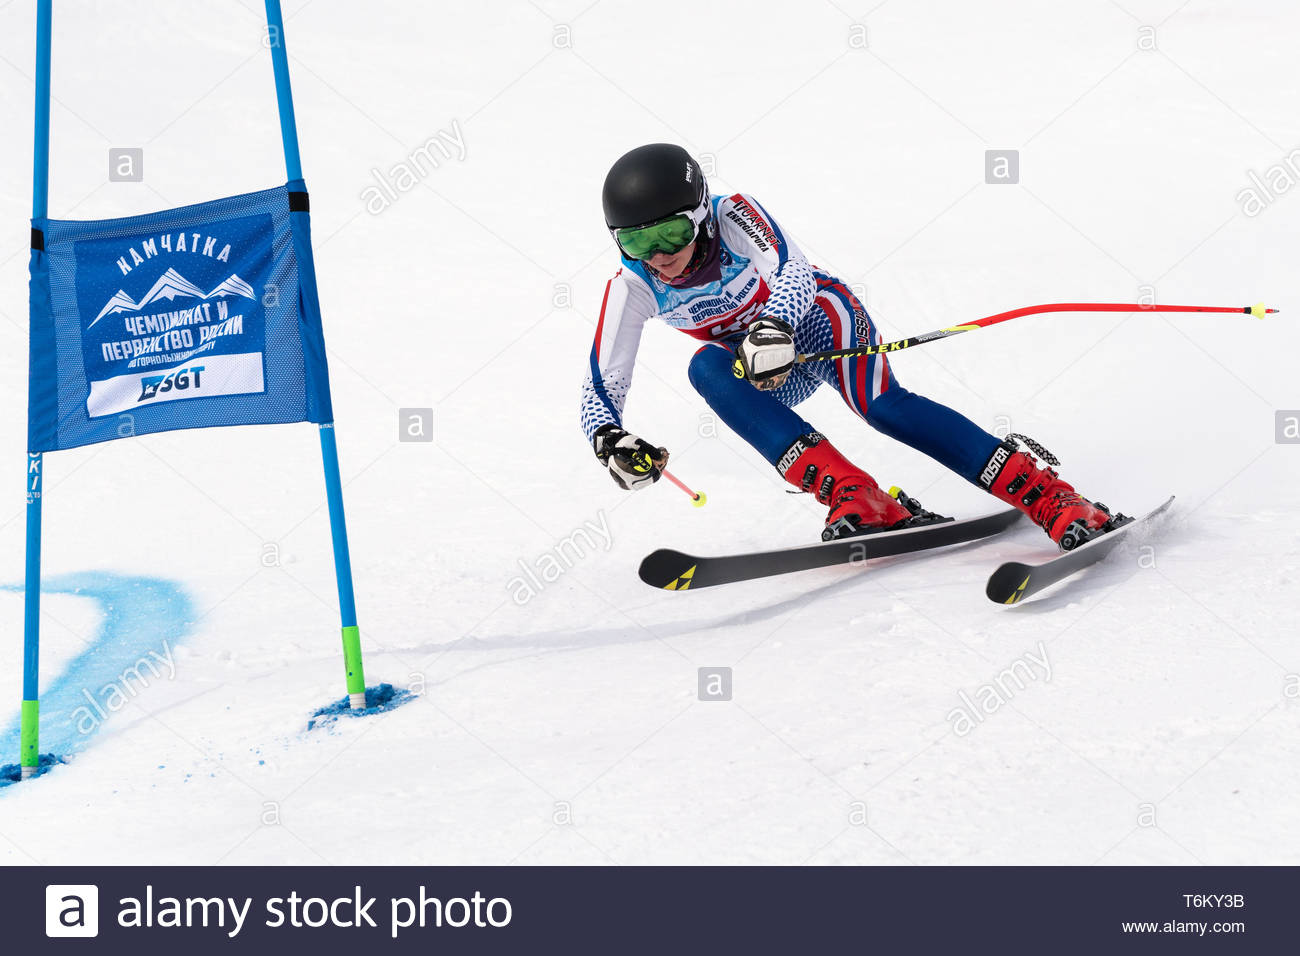 KAMCHATKA PENINSULA, RUSSIA - APR 2, 2019: Mountain skier Anna Martynova (Leningrad Region) skiing down mount. International Ski Federation Championsh - Stock Image